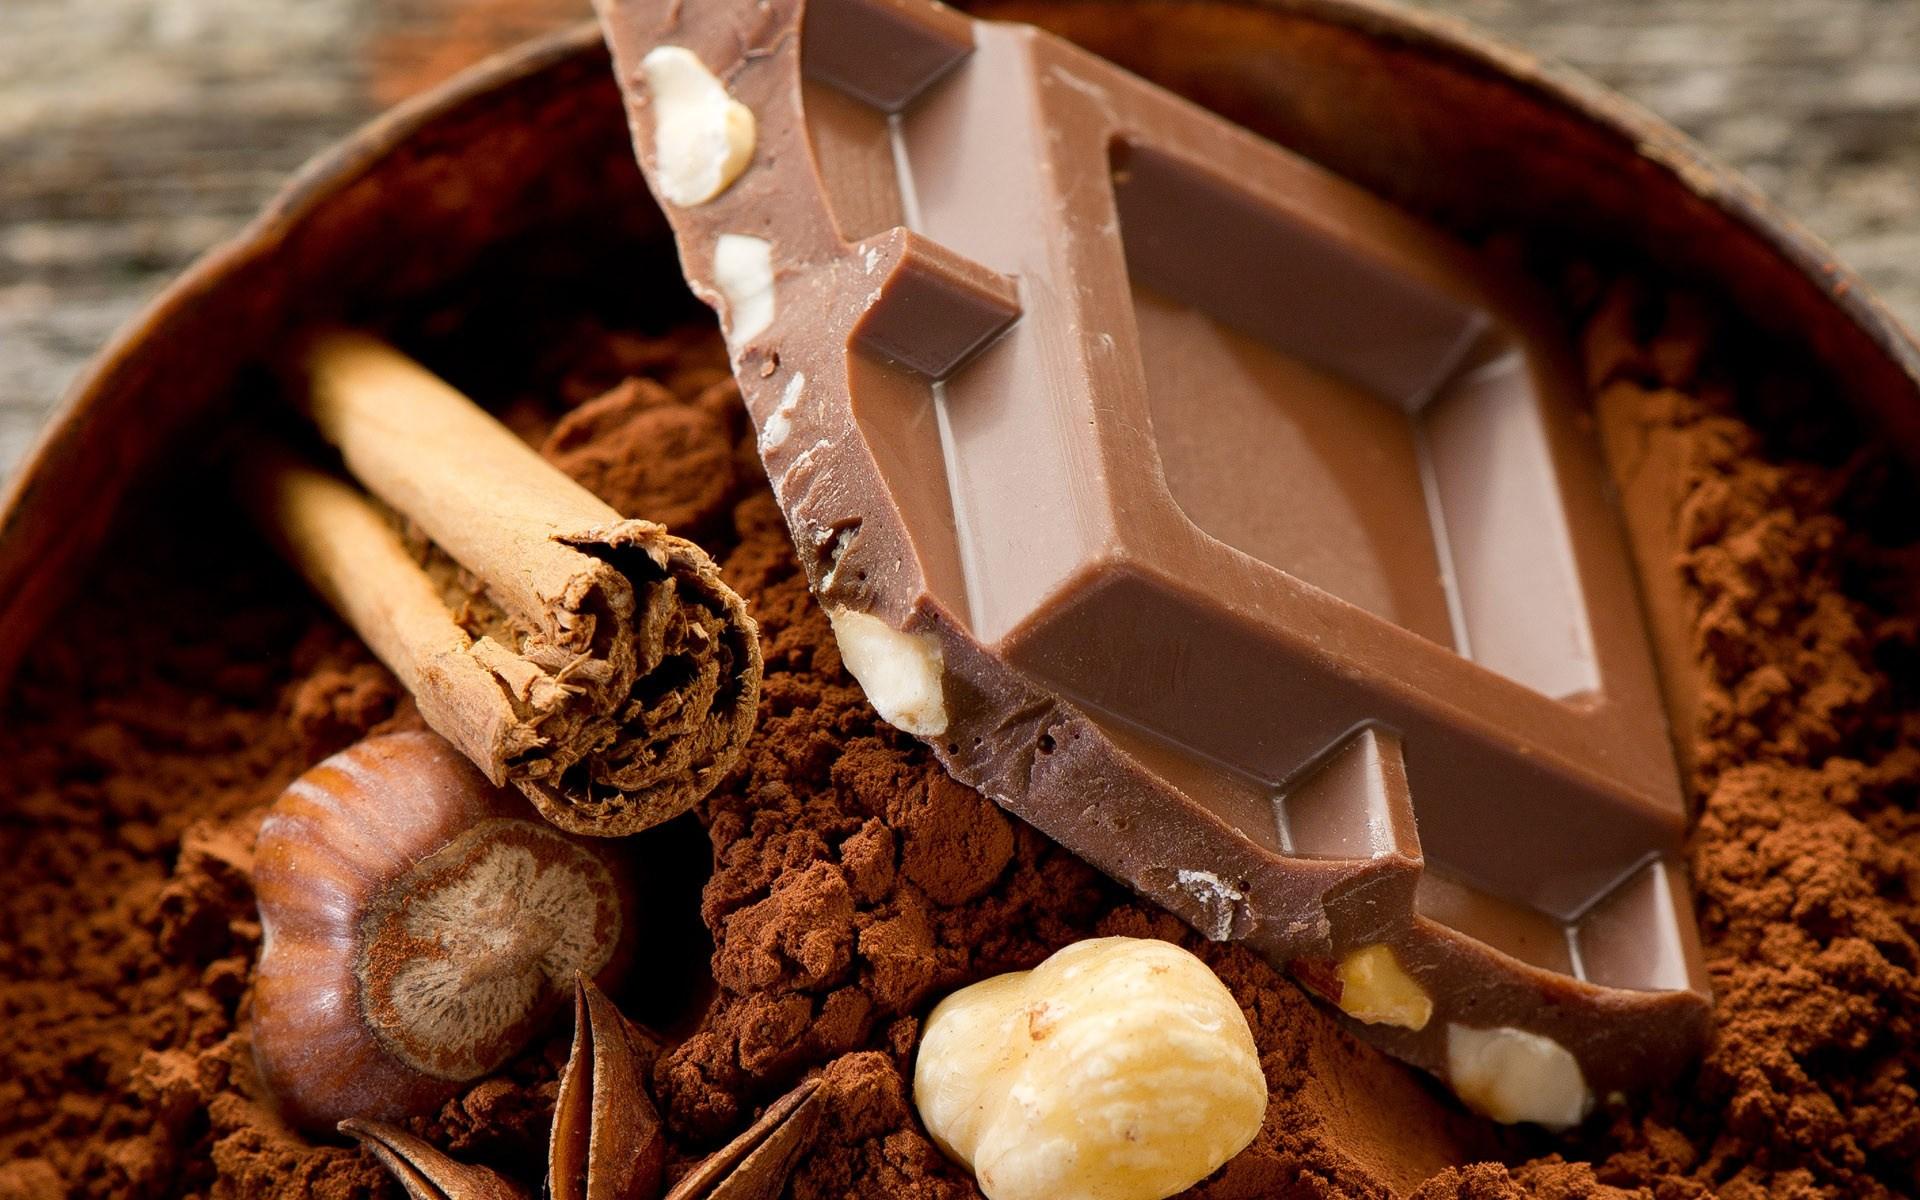 hinh nen chocolate 20